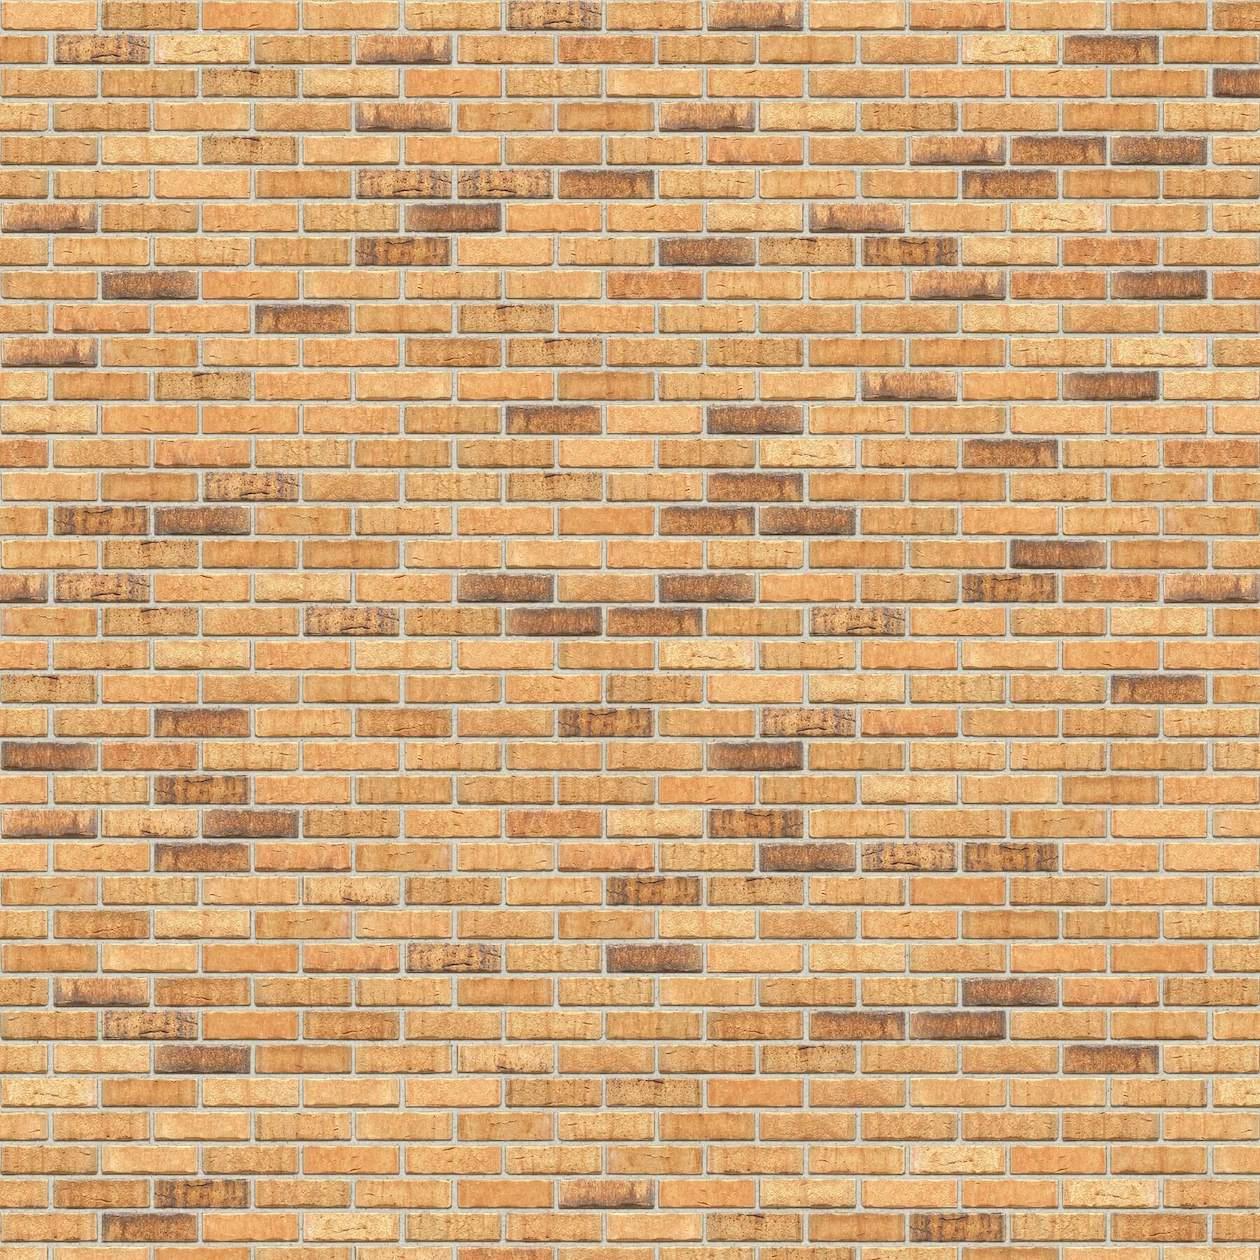 Puna-cigla-FeldHaus-Klinker-brick-house-nf-k-665-Bela Fuga